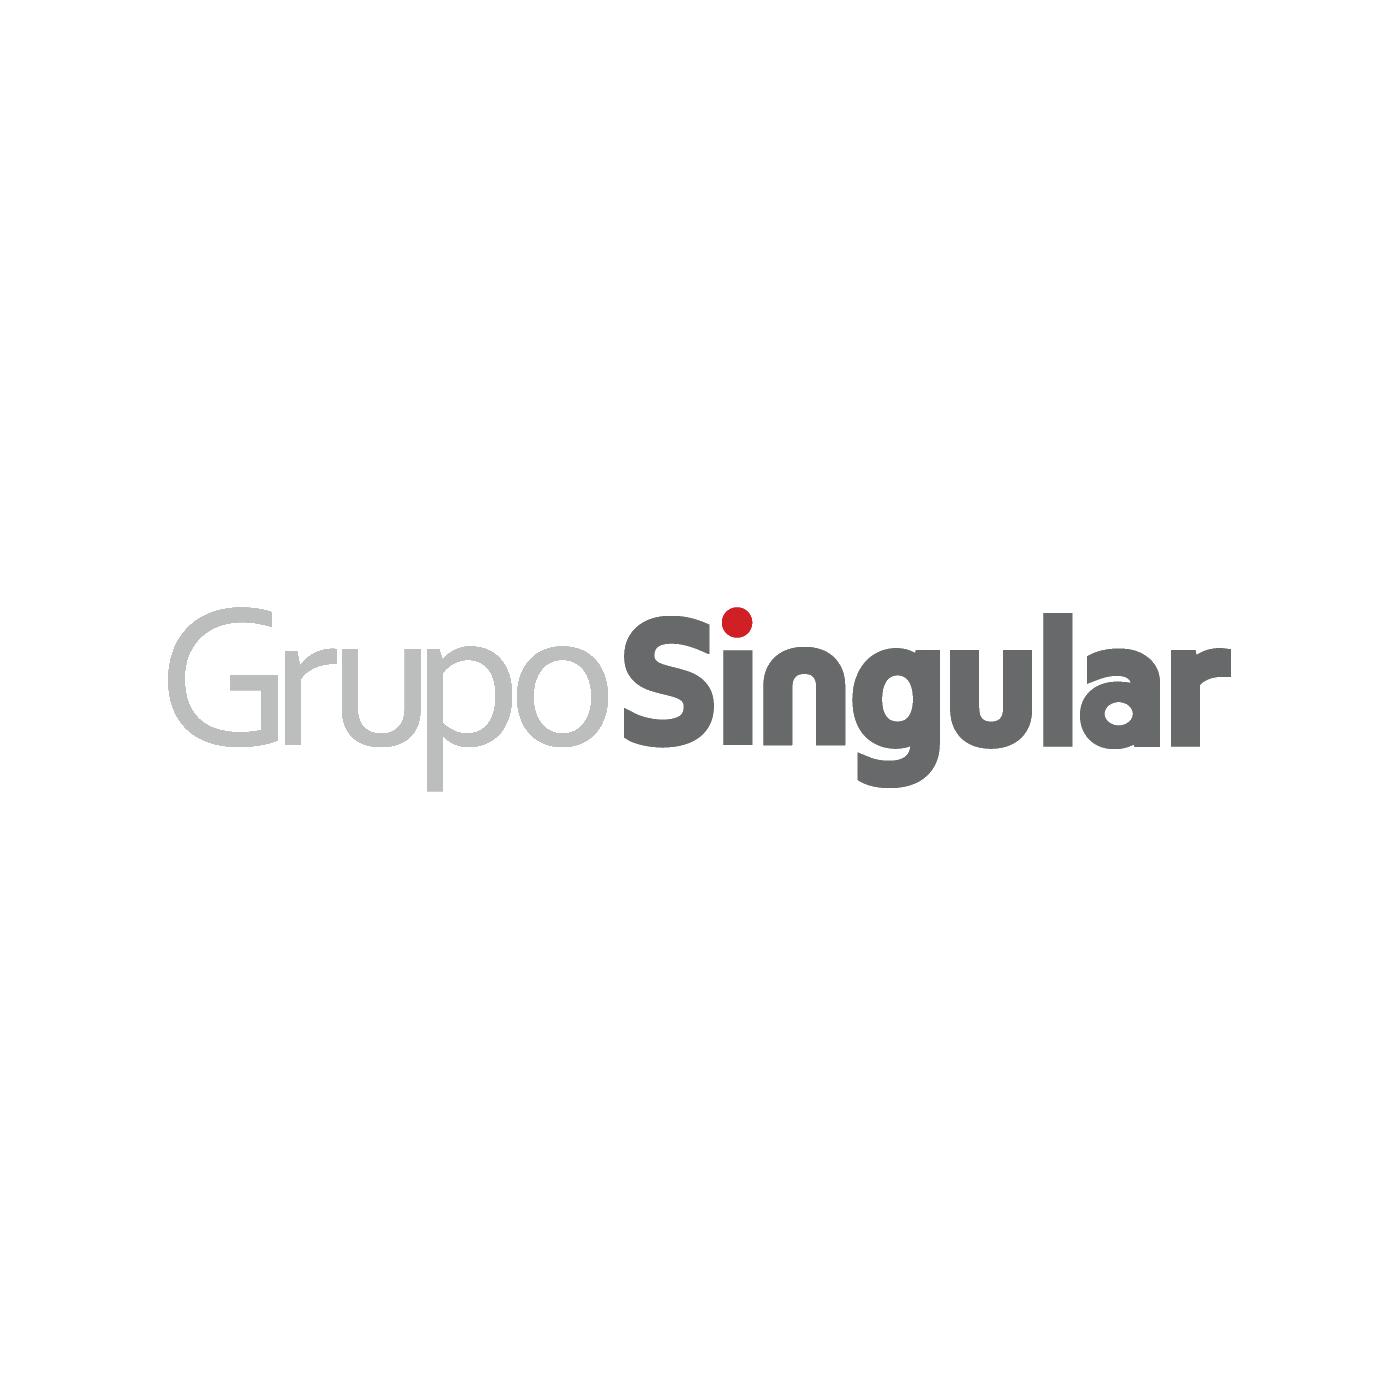 Grupo Singular